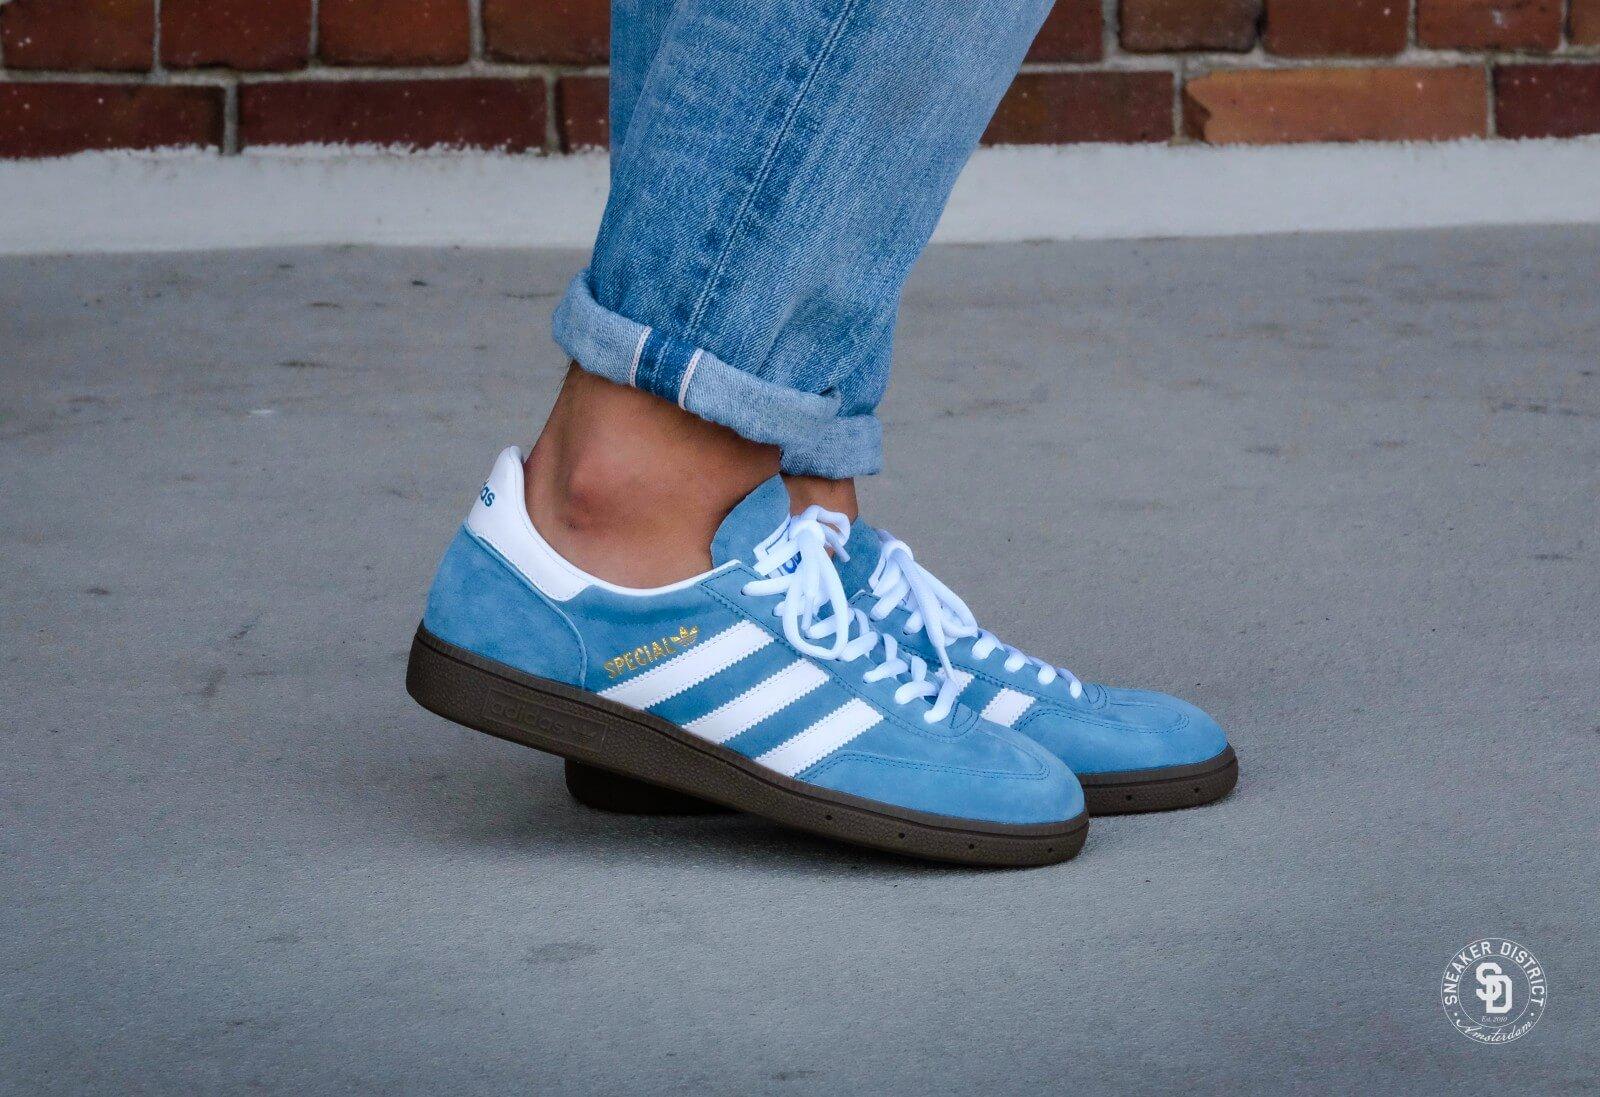 Adidas Handball Spezial Blue Footwear White Gum 033620